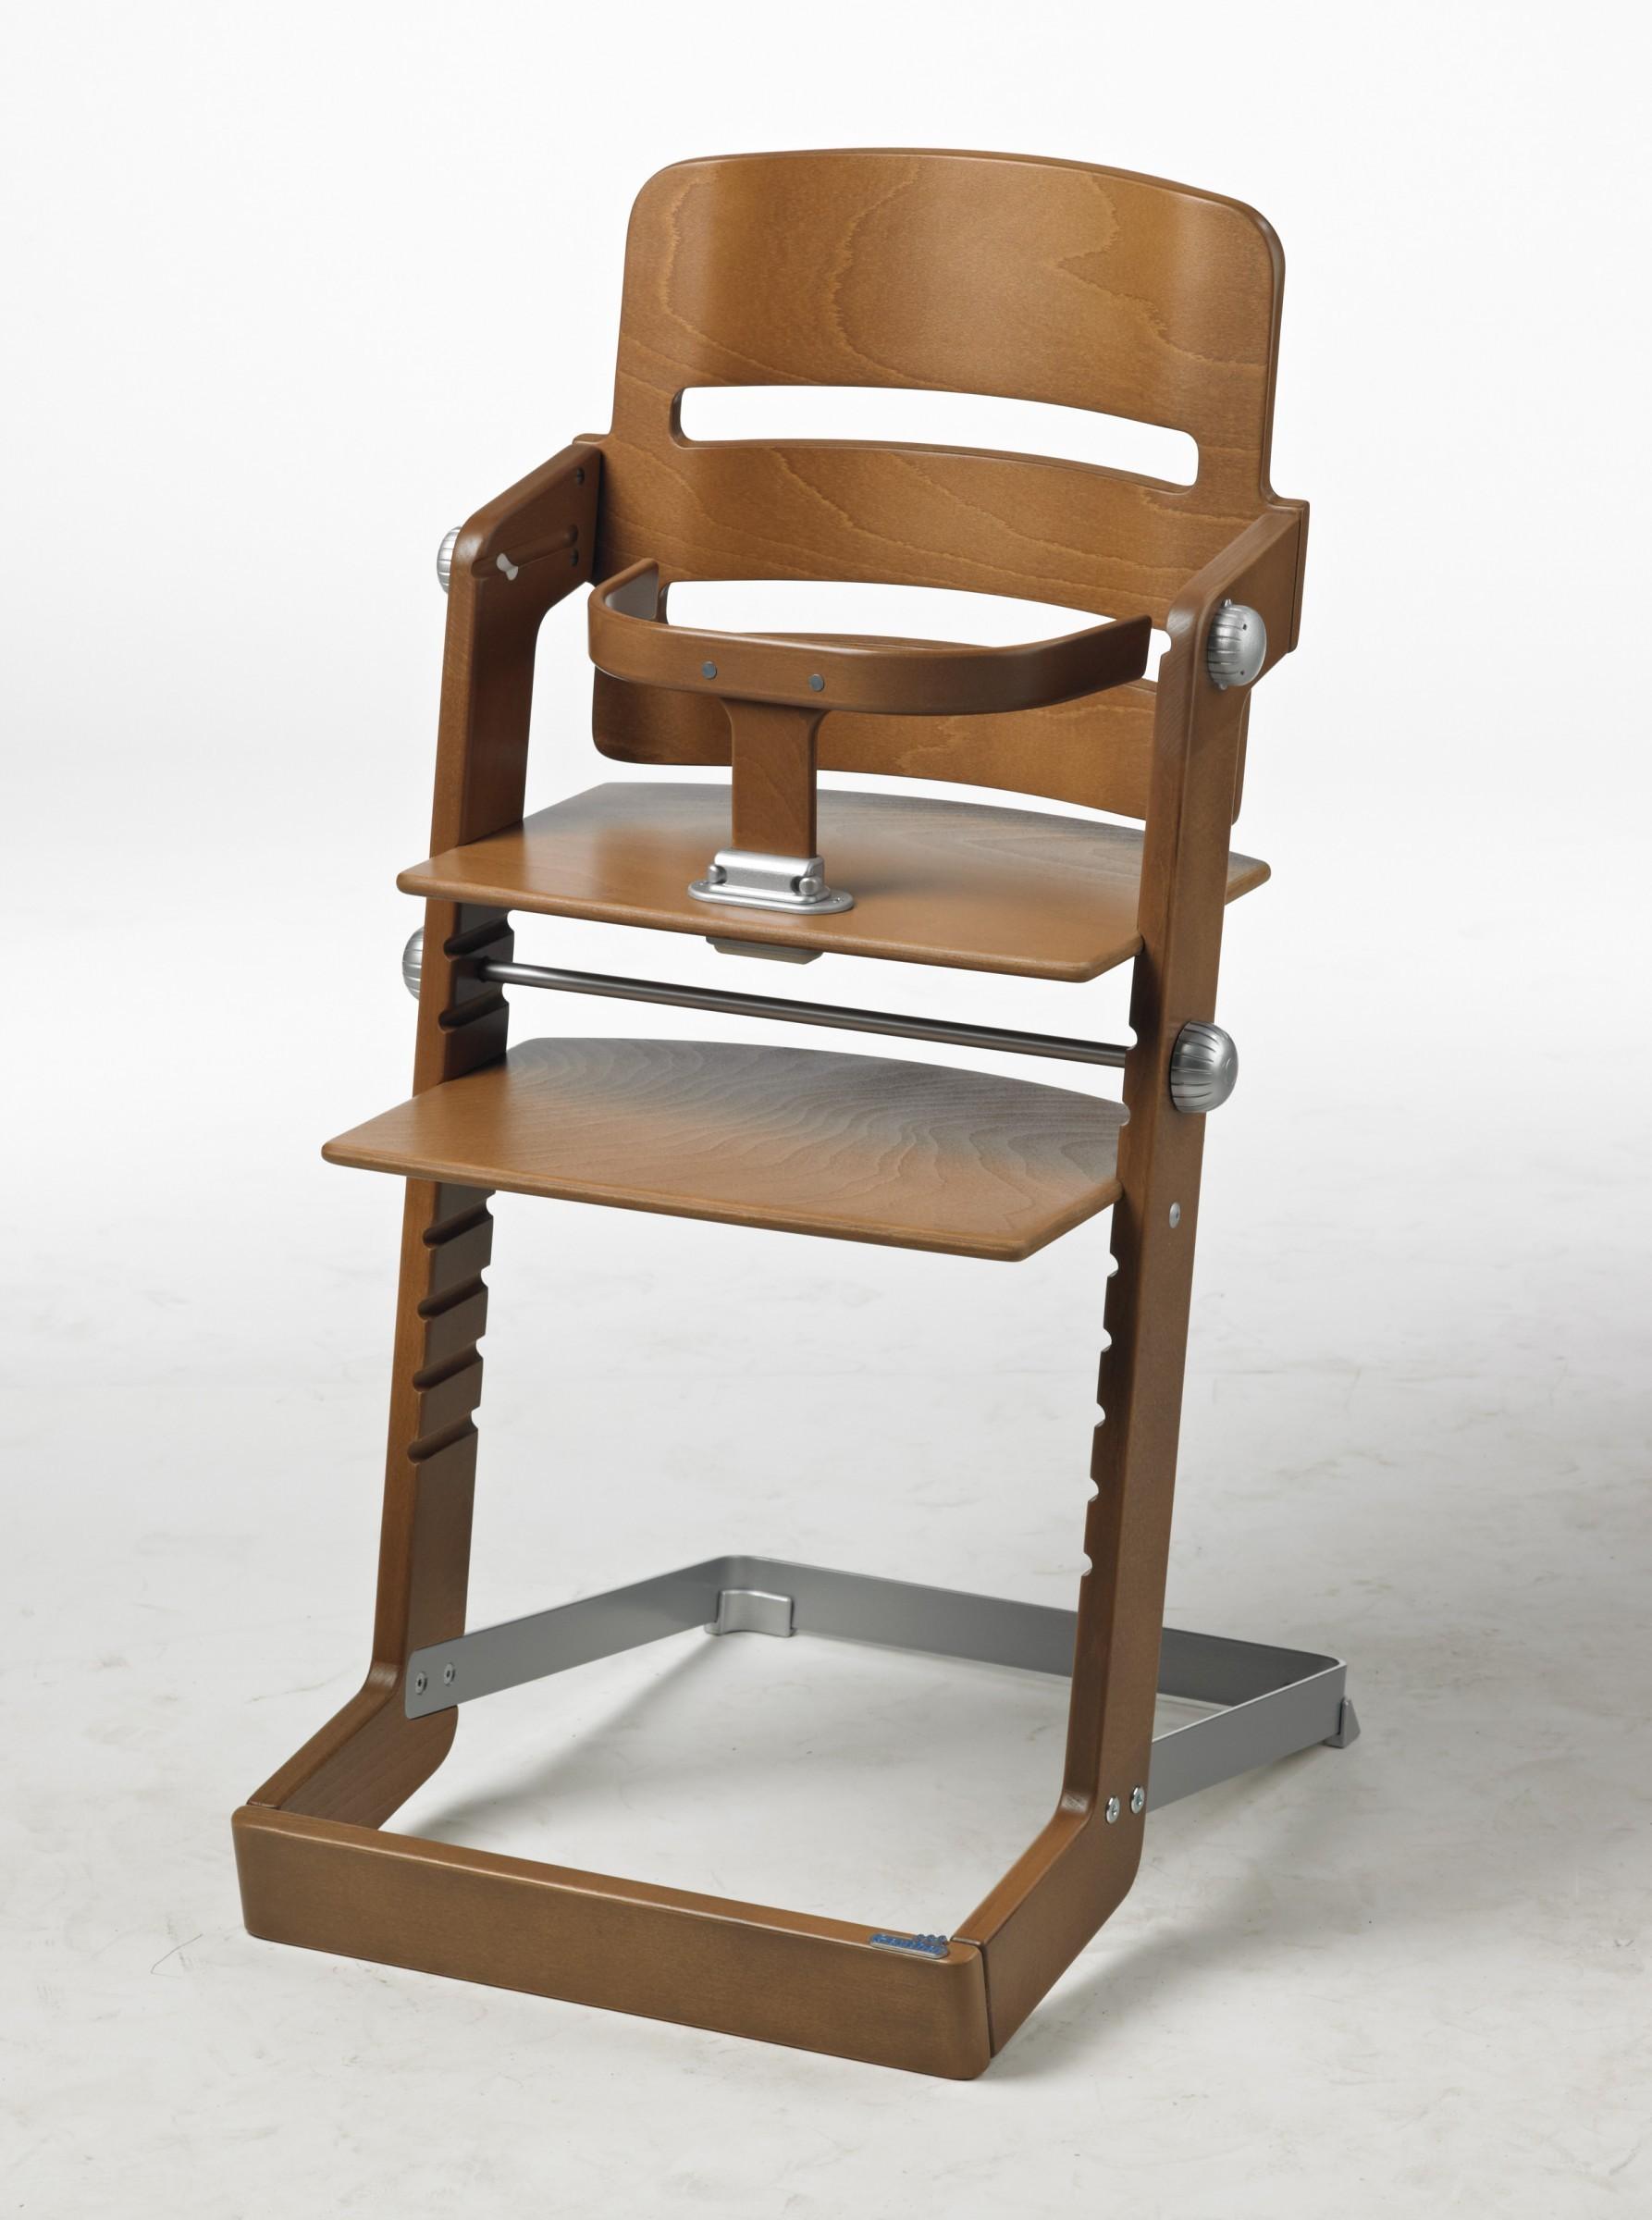 babywipper baby online shop top preise kinderhaus. Black Bedroom Furniture Sets. Home Design Ideas